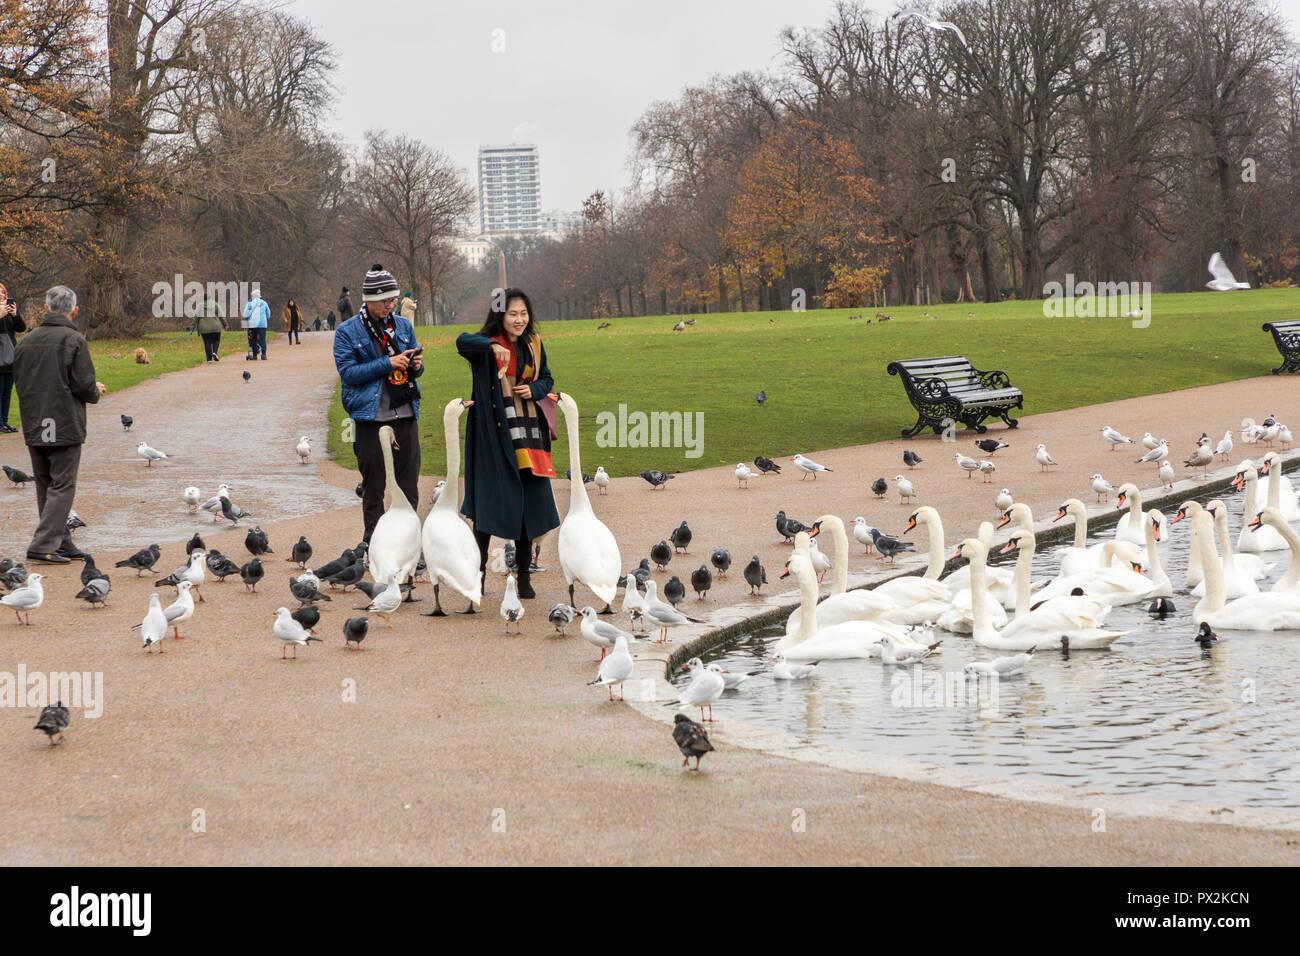 Feeding birds in Kensington Gardens, London - Stock Image